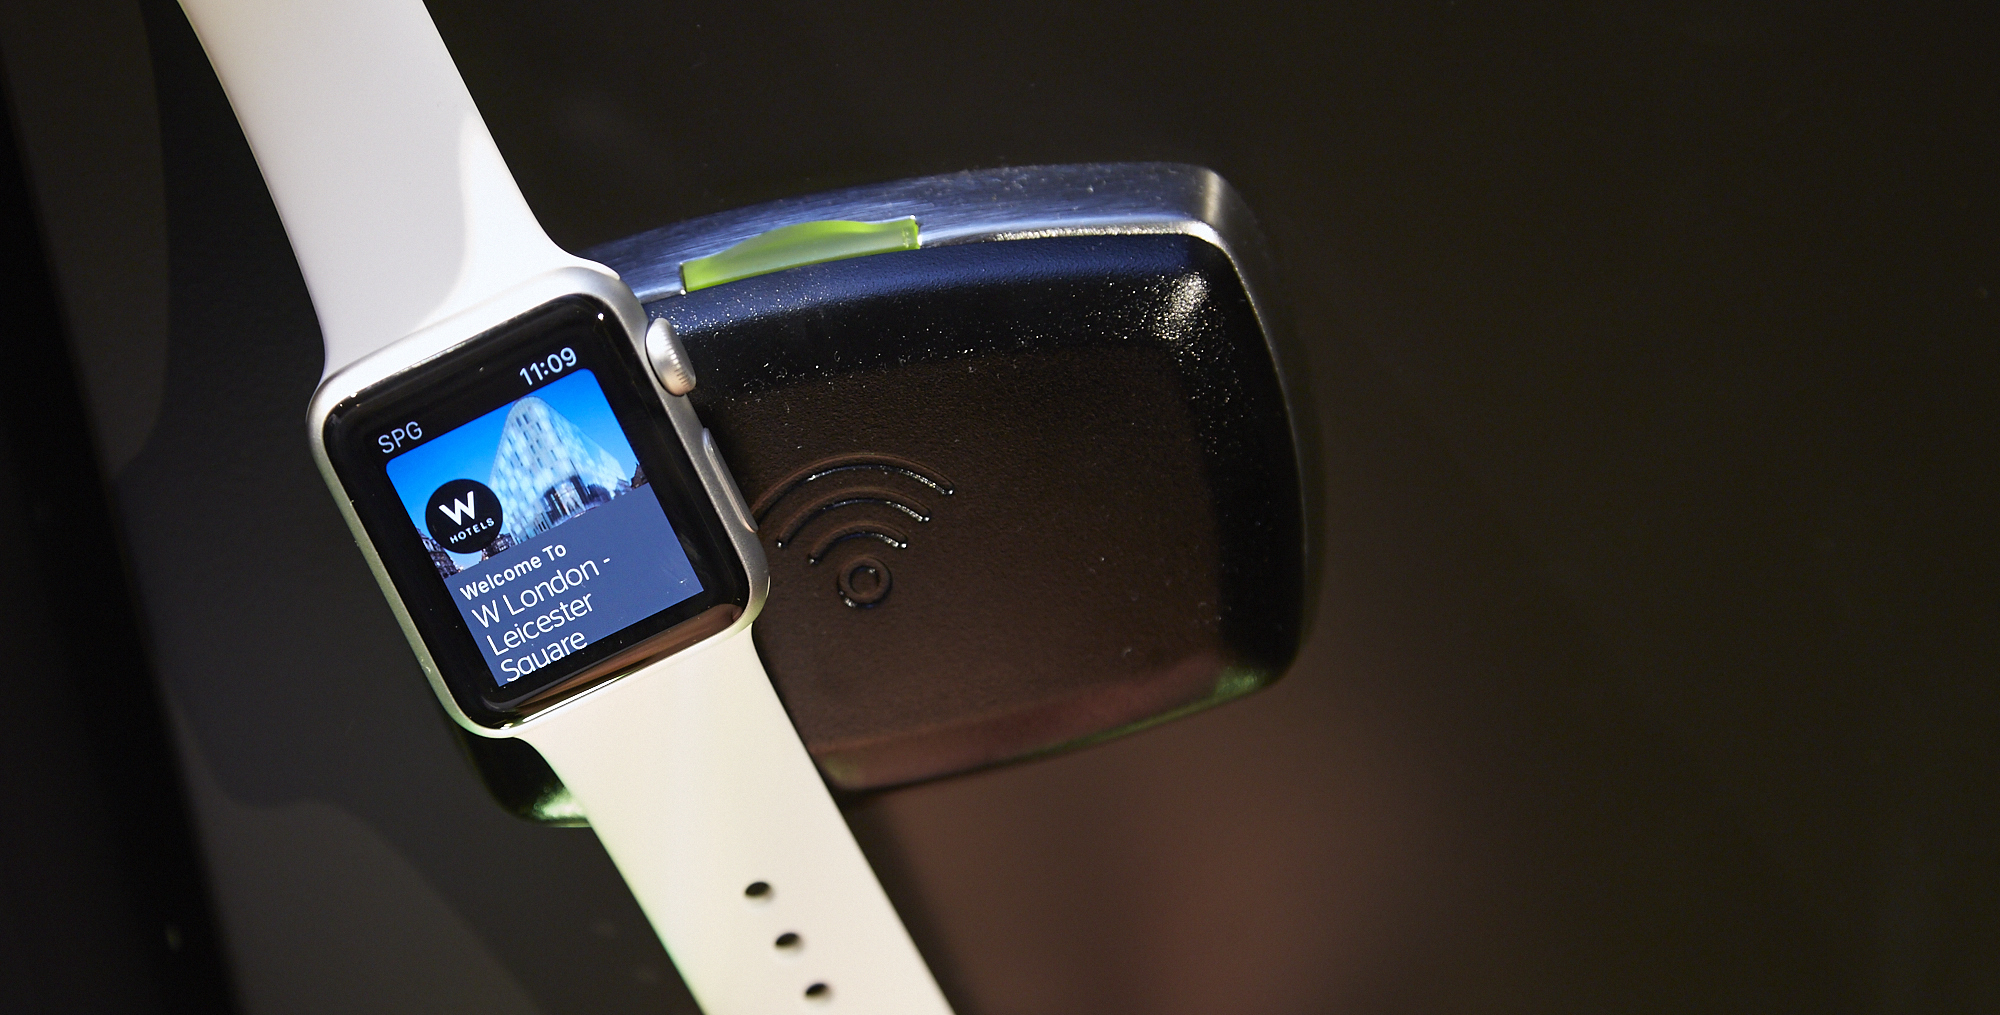 Starwood Introduces Keyless Hotel Access Through Apple Watch